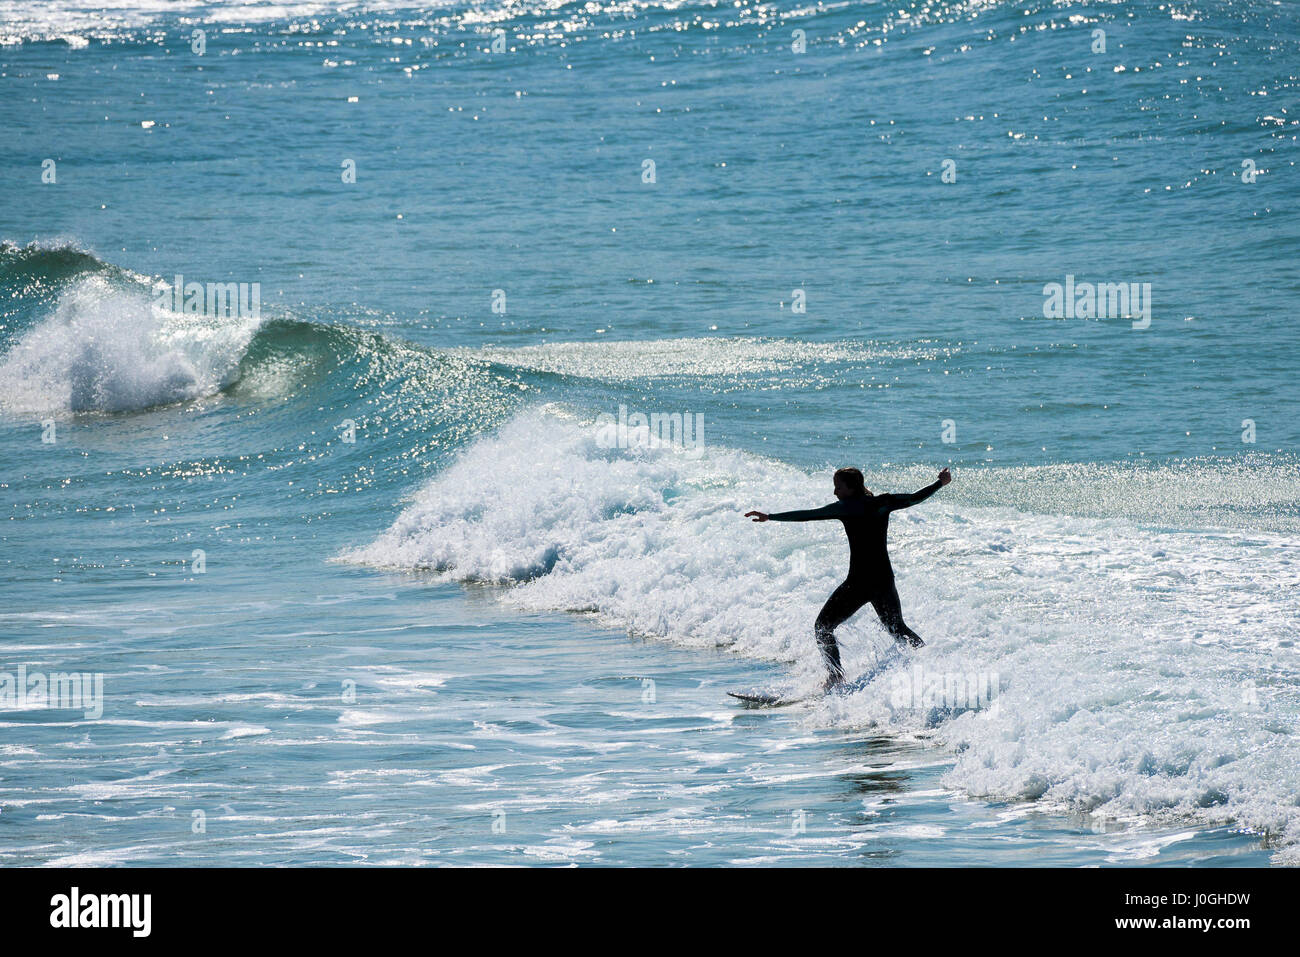 Surfer UK Sea Surfing Longboard Water Hobby Leisure activity Balance Newquay Cornwall - Stock Image